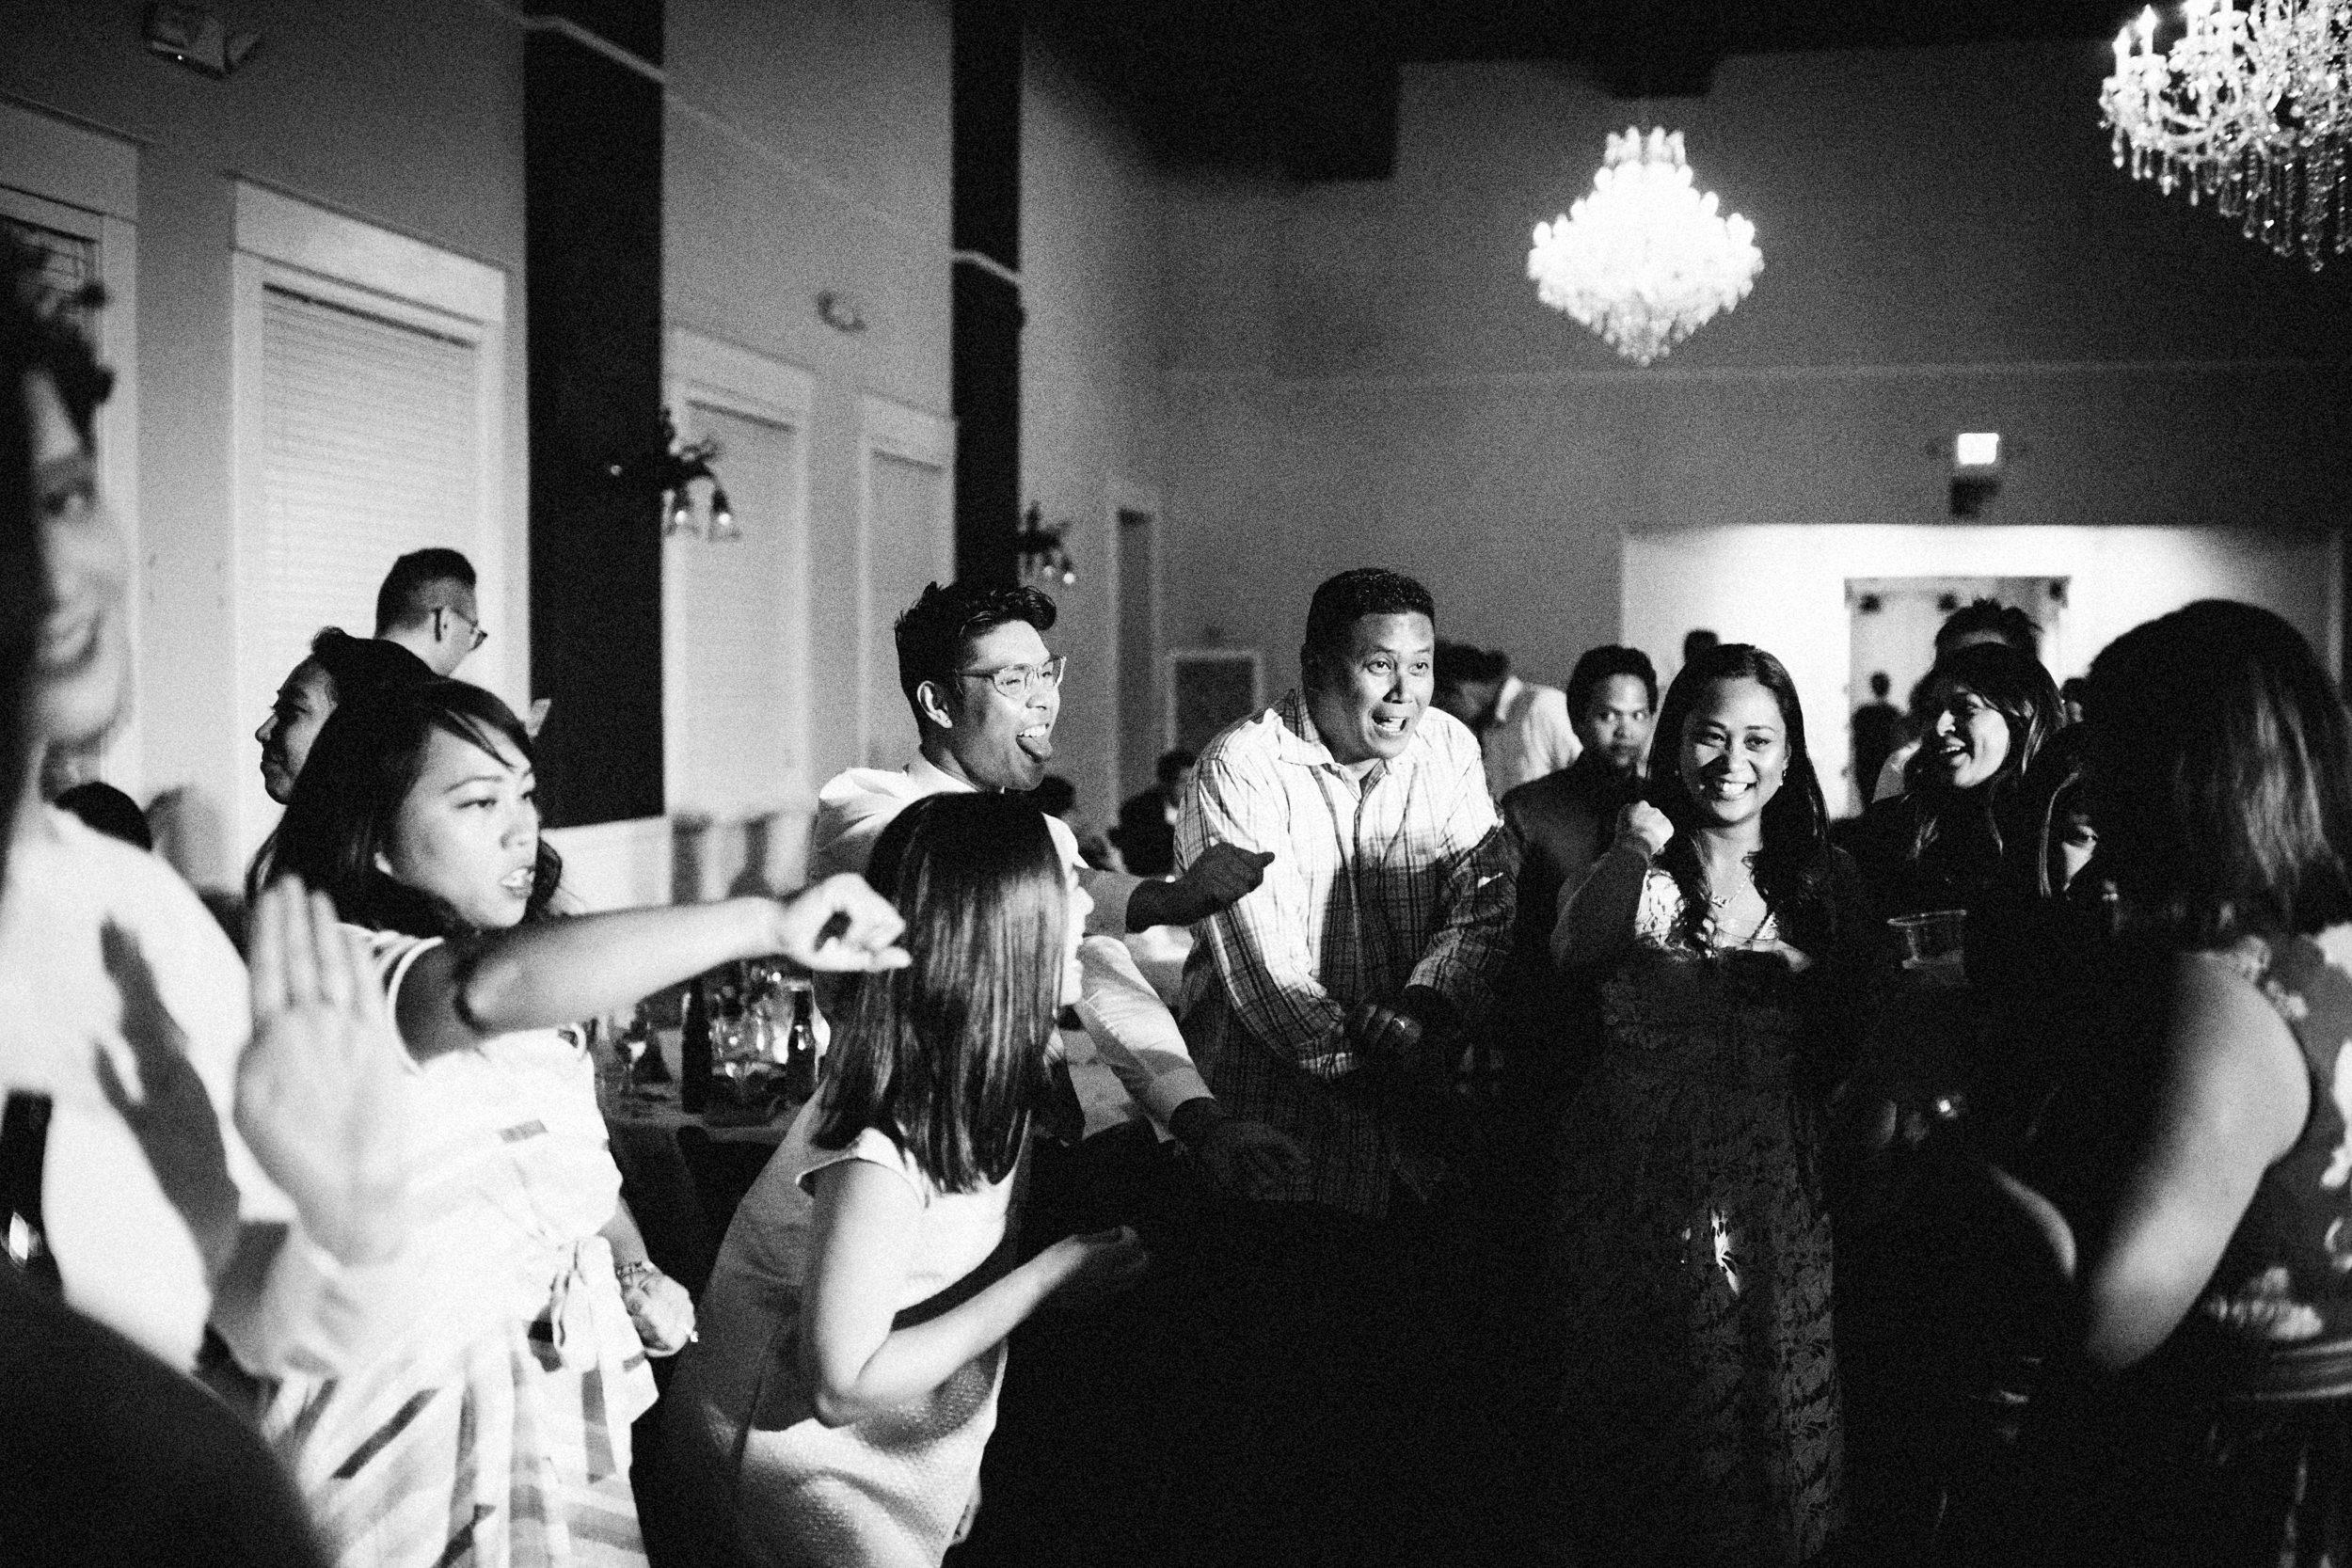 lauren-dean-wedding-grand-lodge-kentucky-sarah-katherine-davis-photography-696edit.jpg